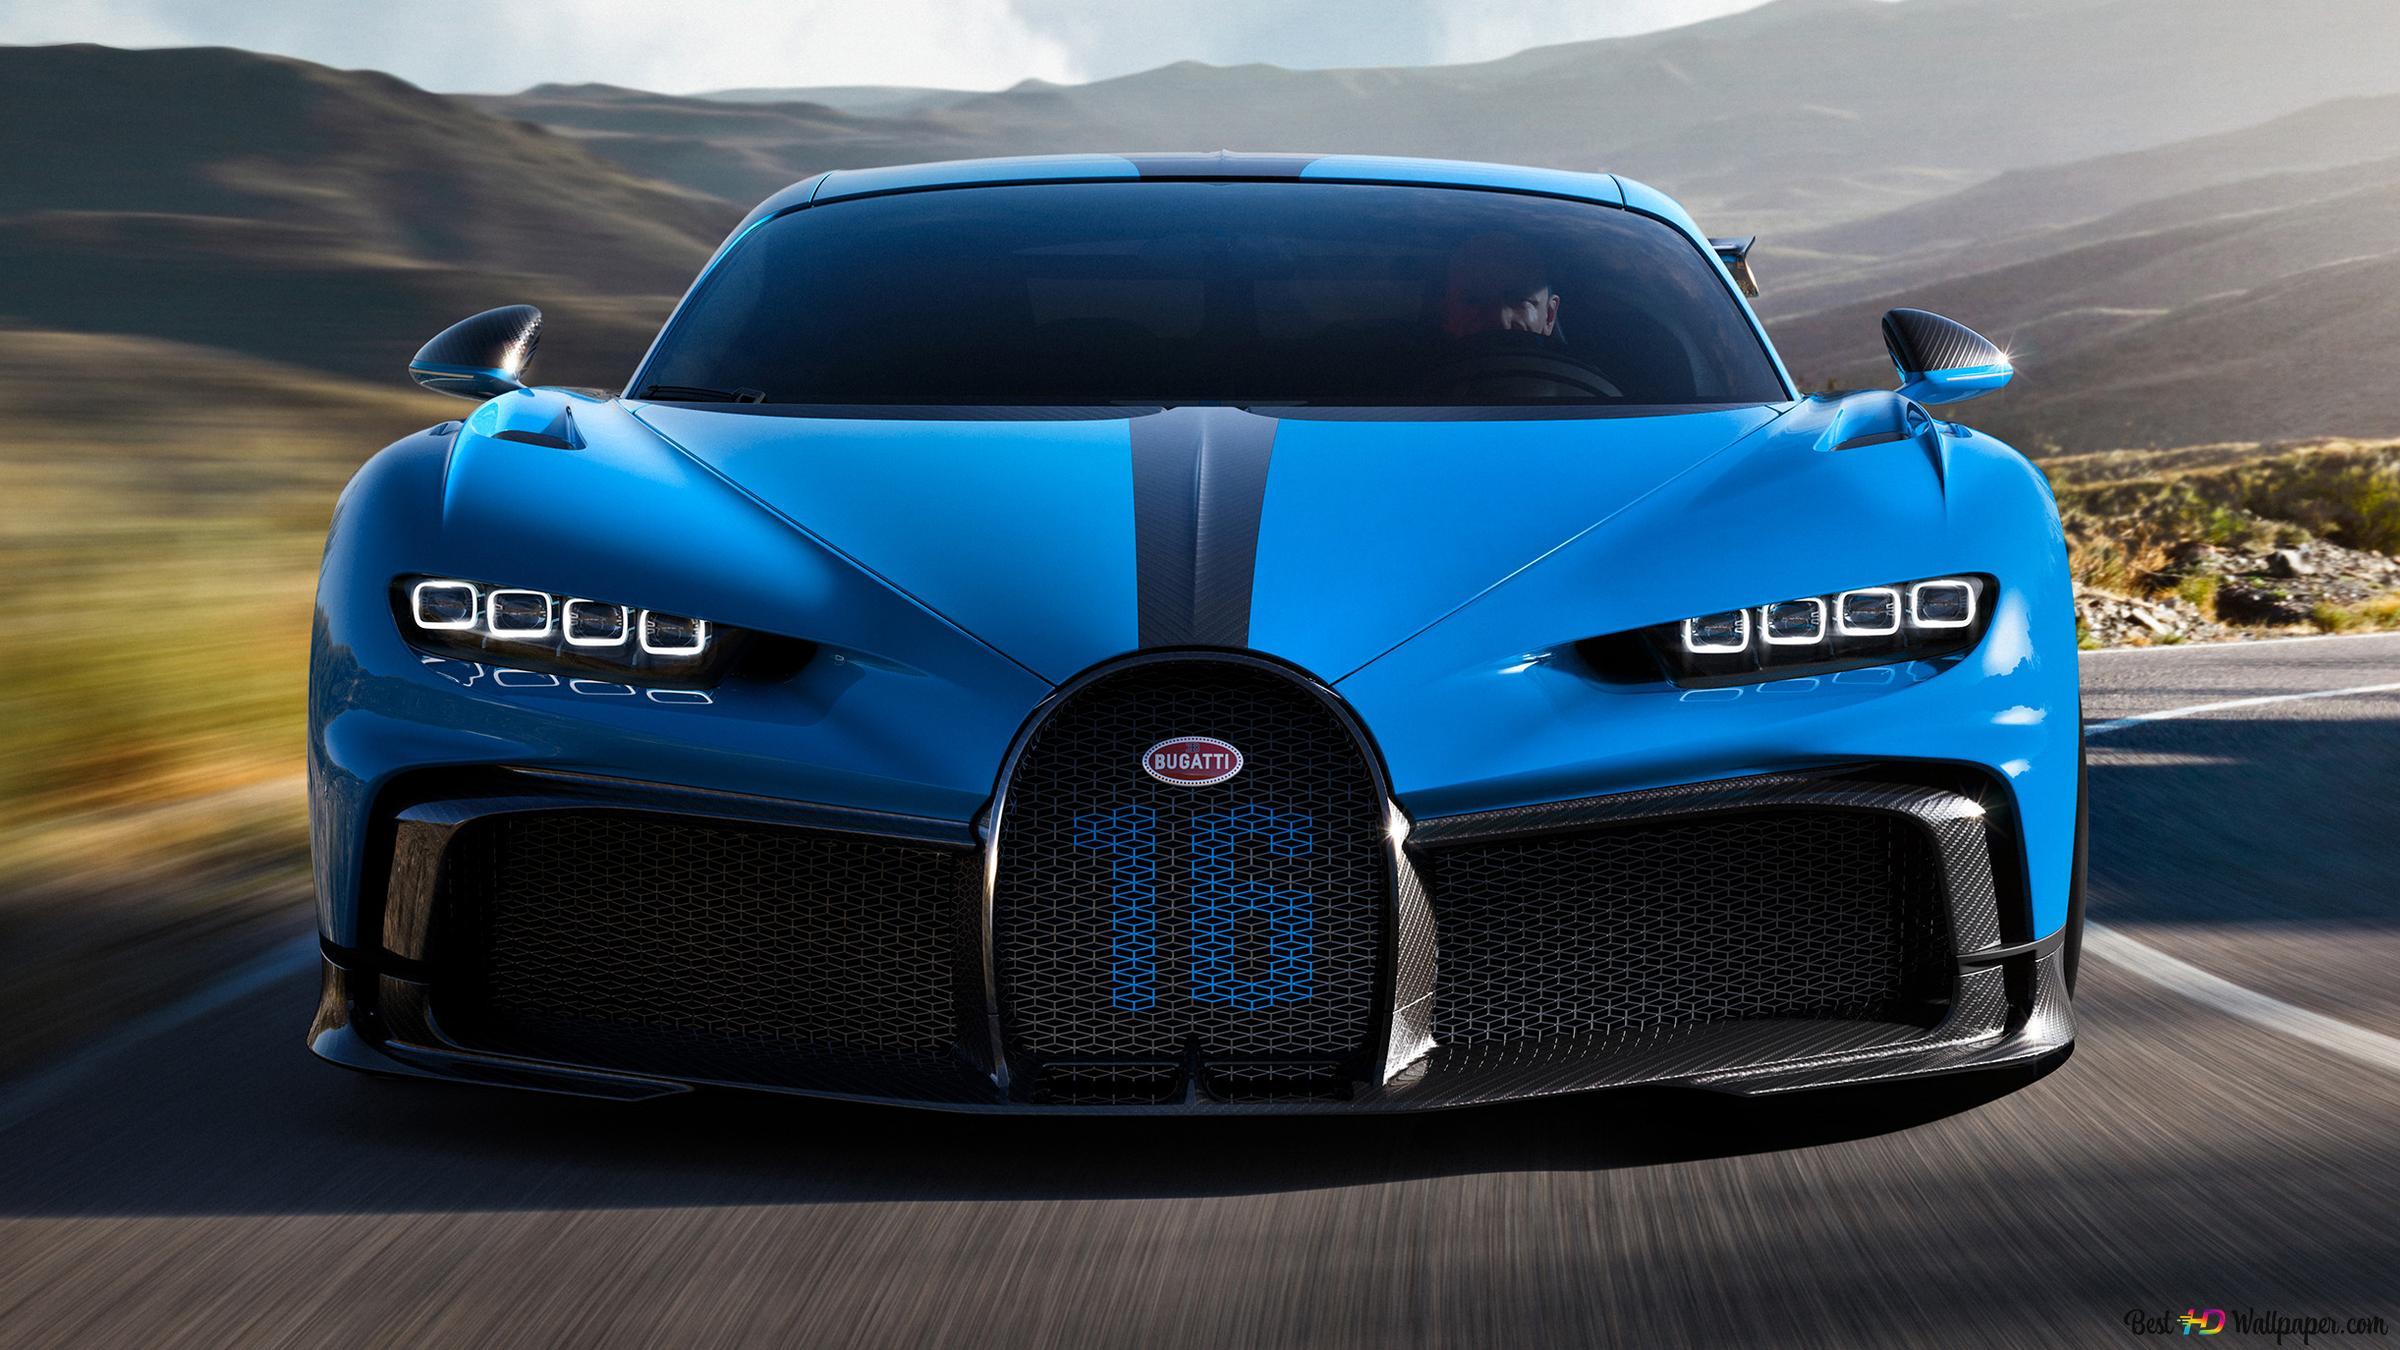 Blue Bugatti Chiron Front Side View Hd Wallpaper Download